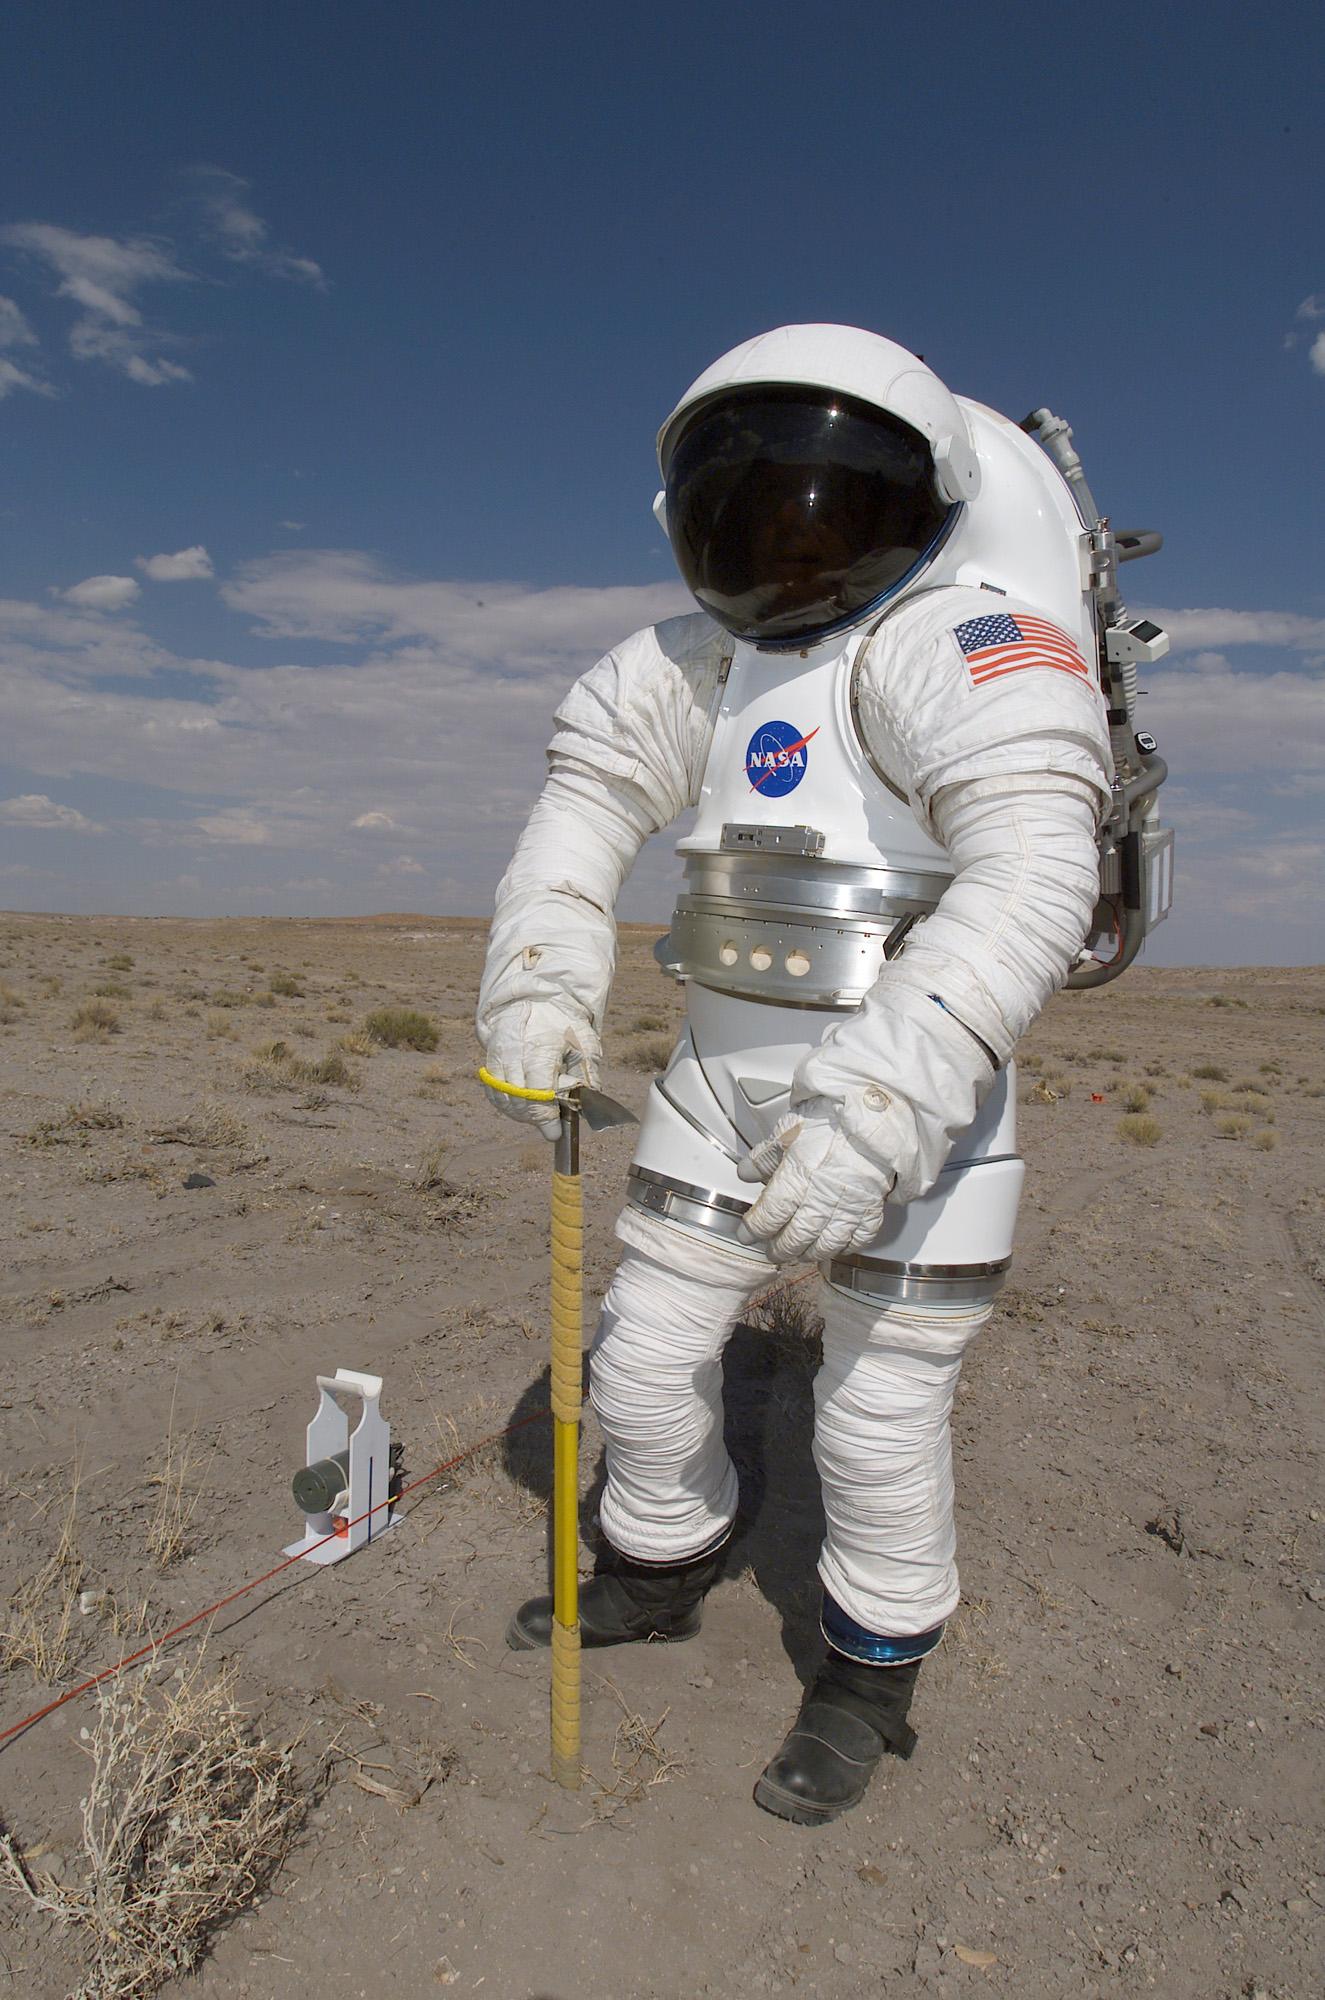 MK III Advanced Spacesuit